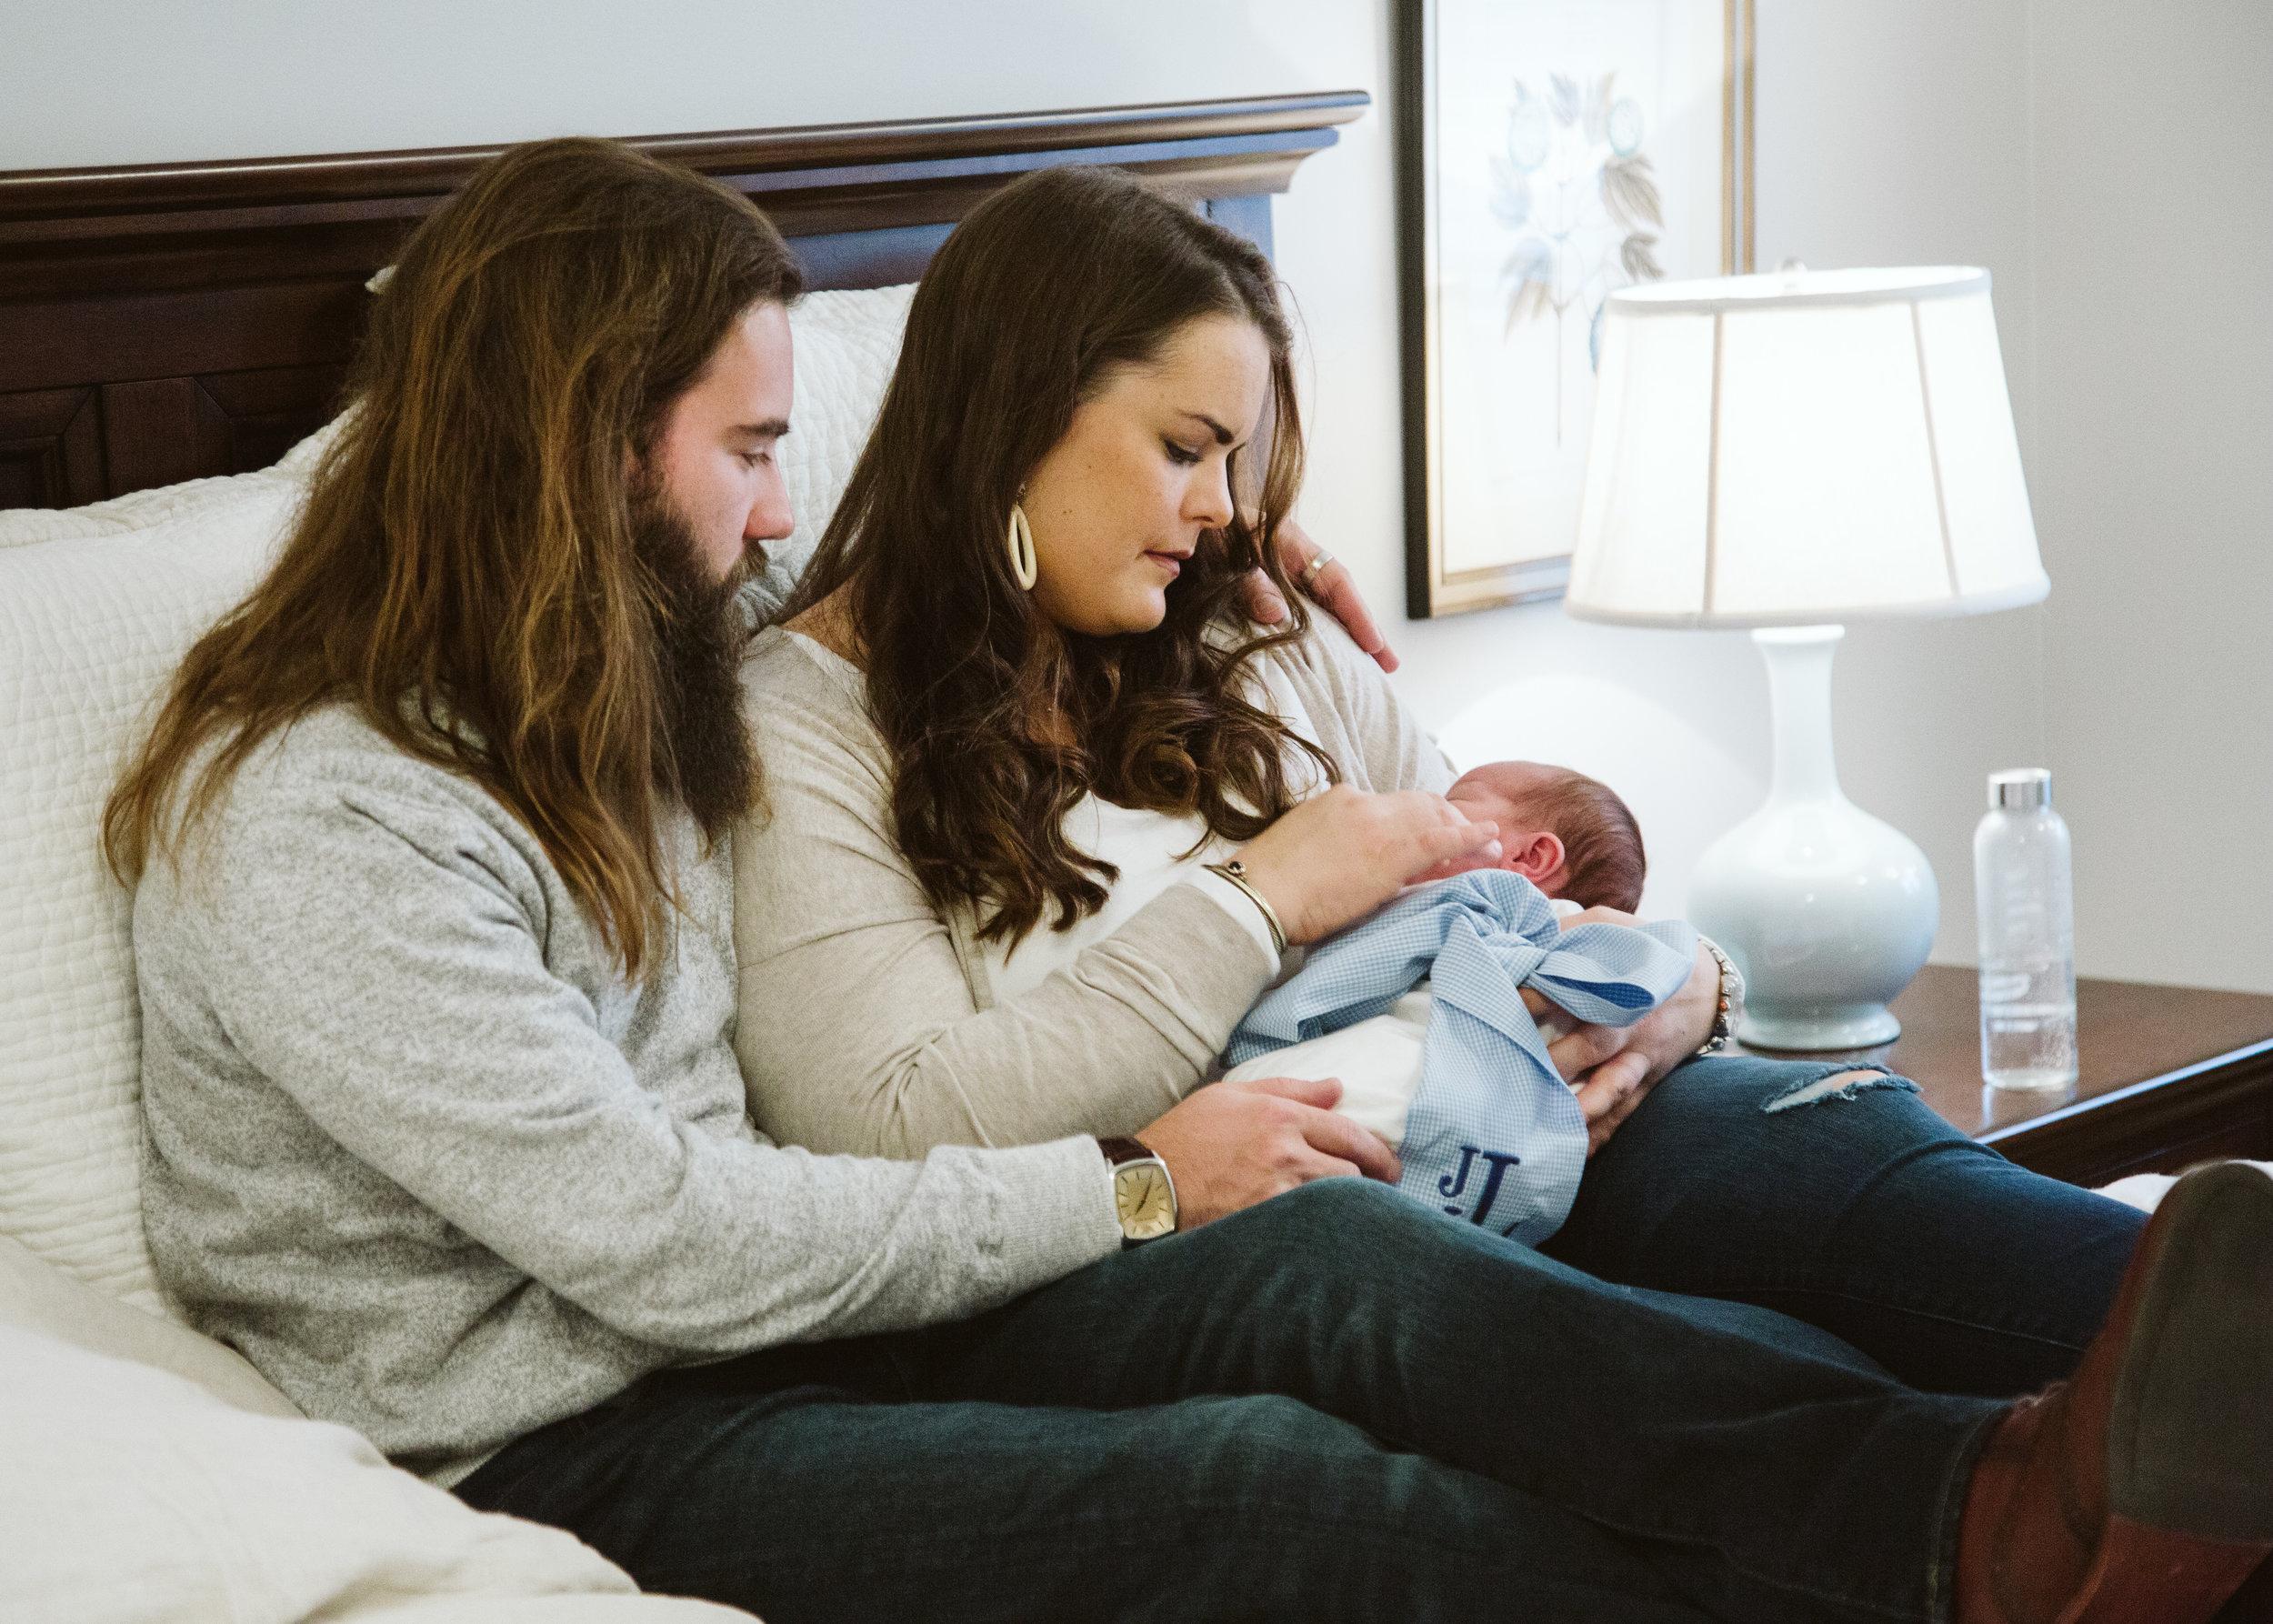 louisville newborn session